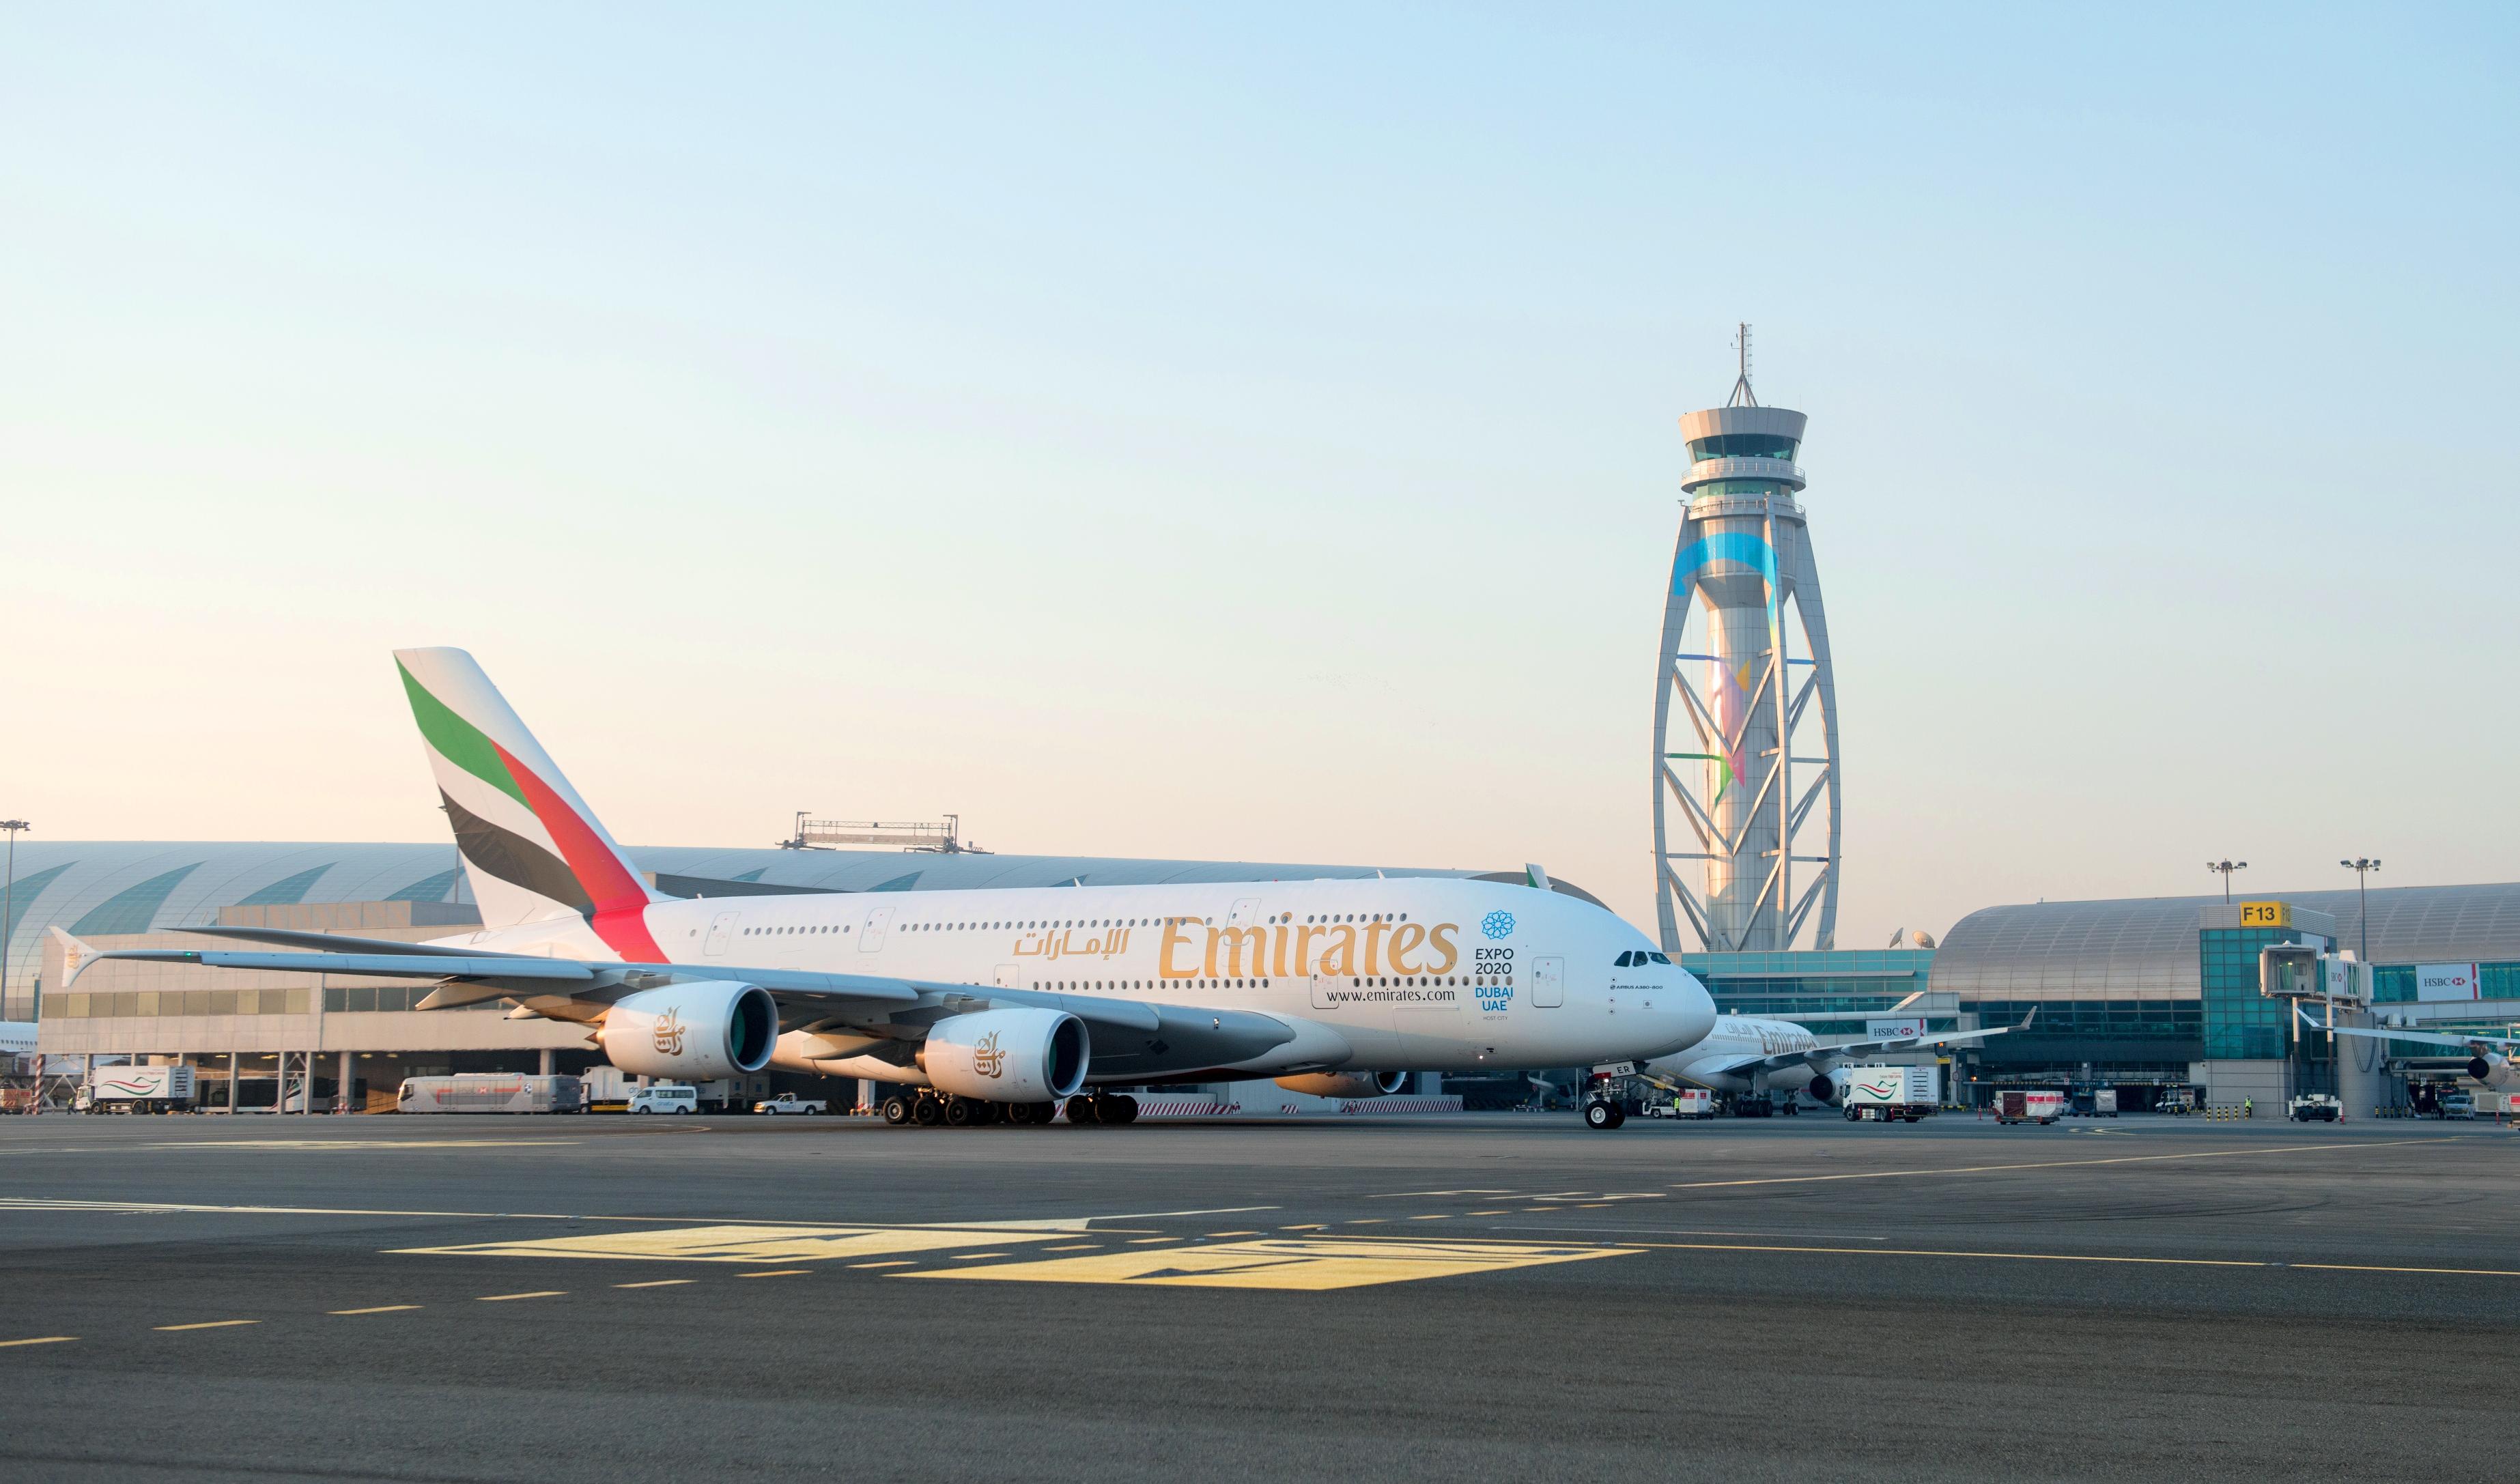 Emirates Staff Travel Contact Number Dubai